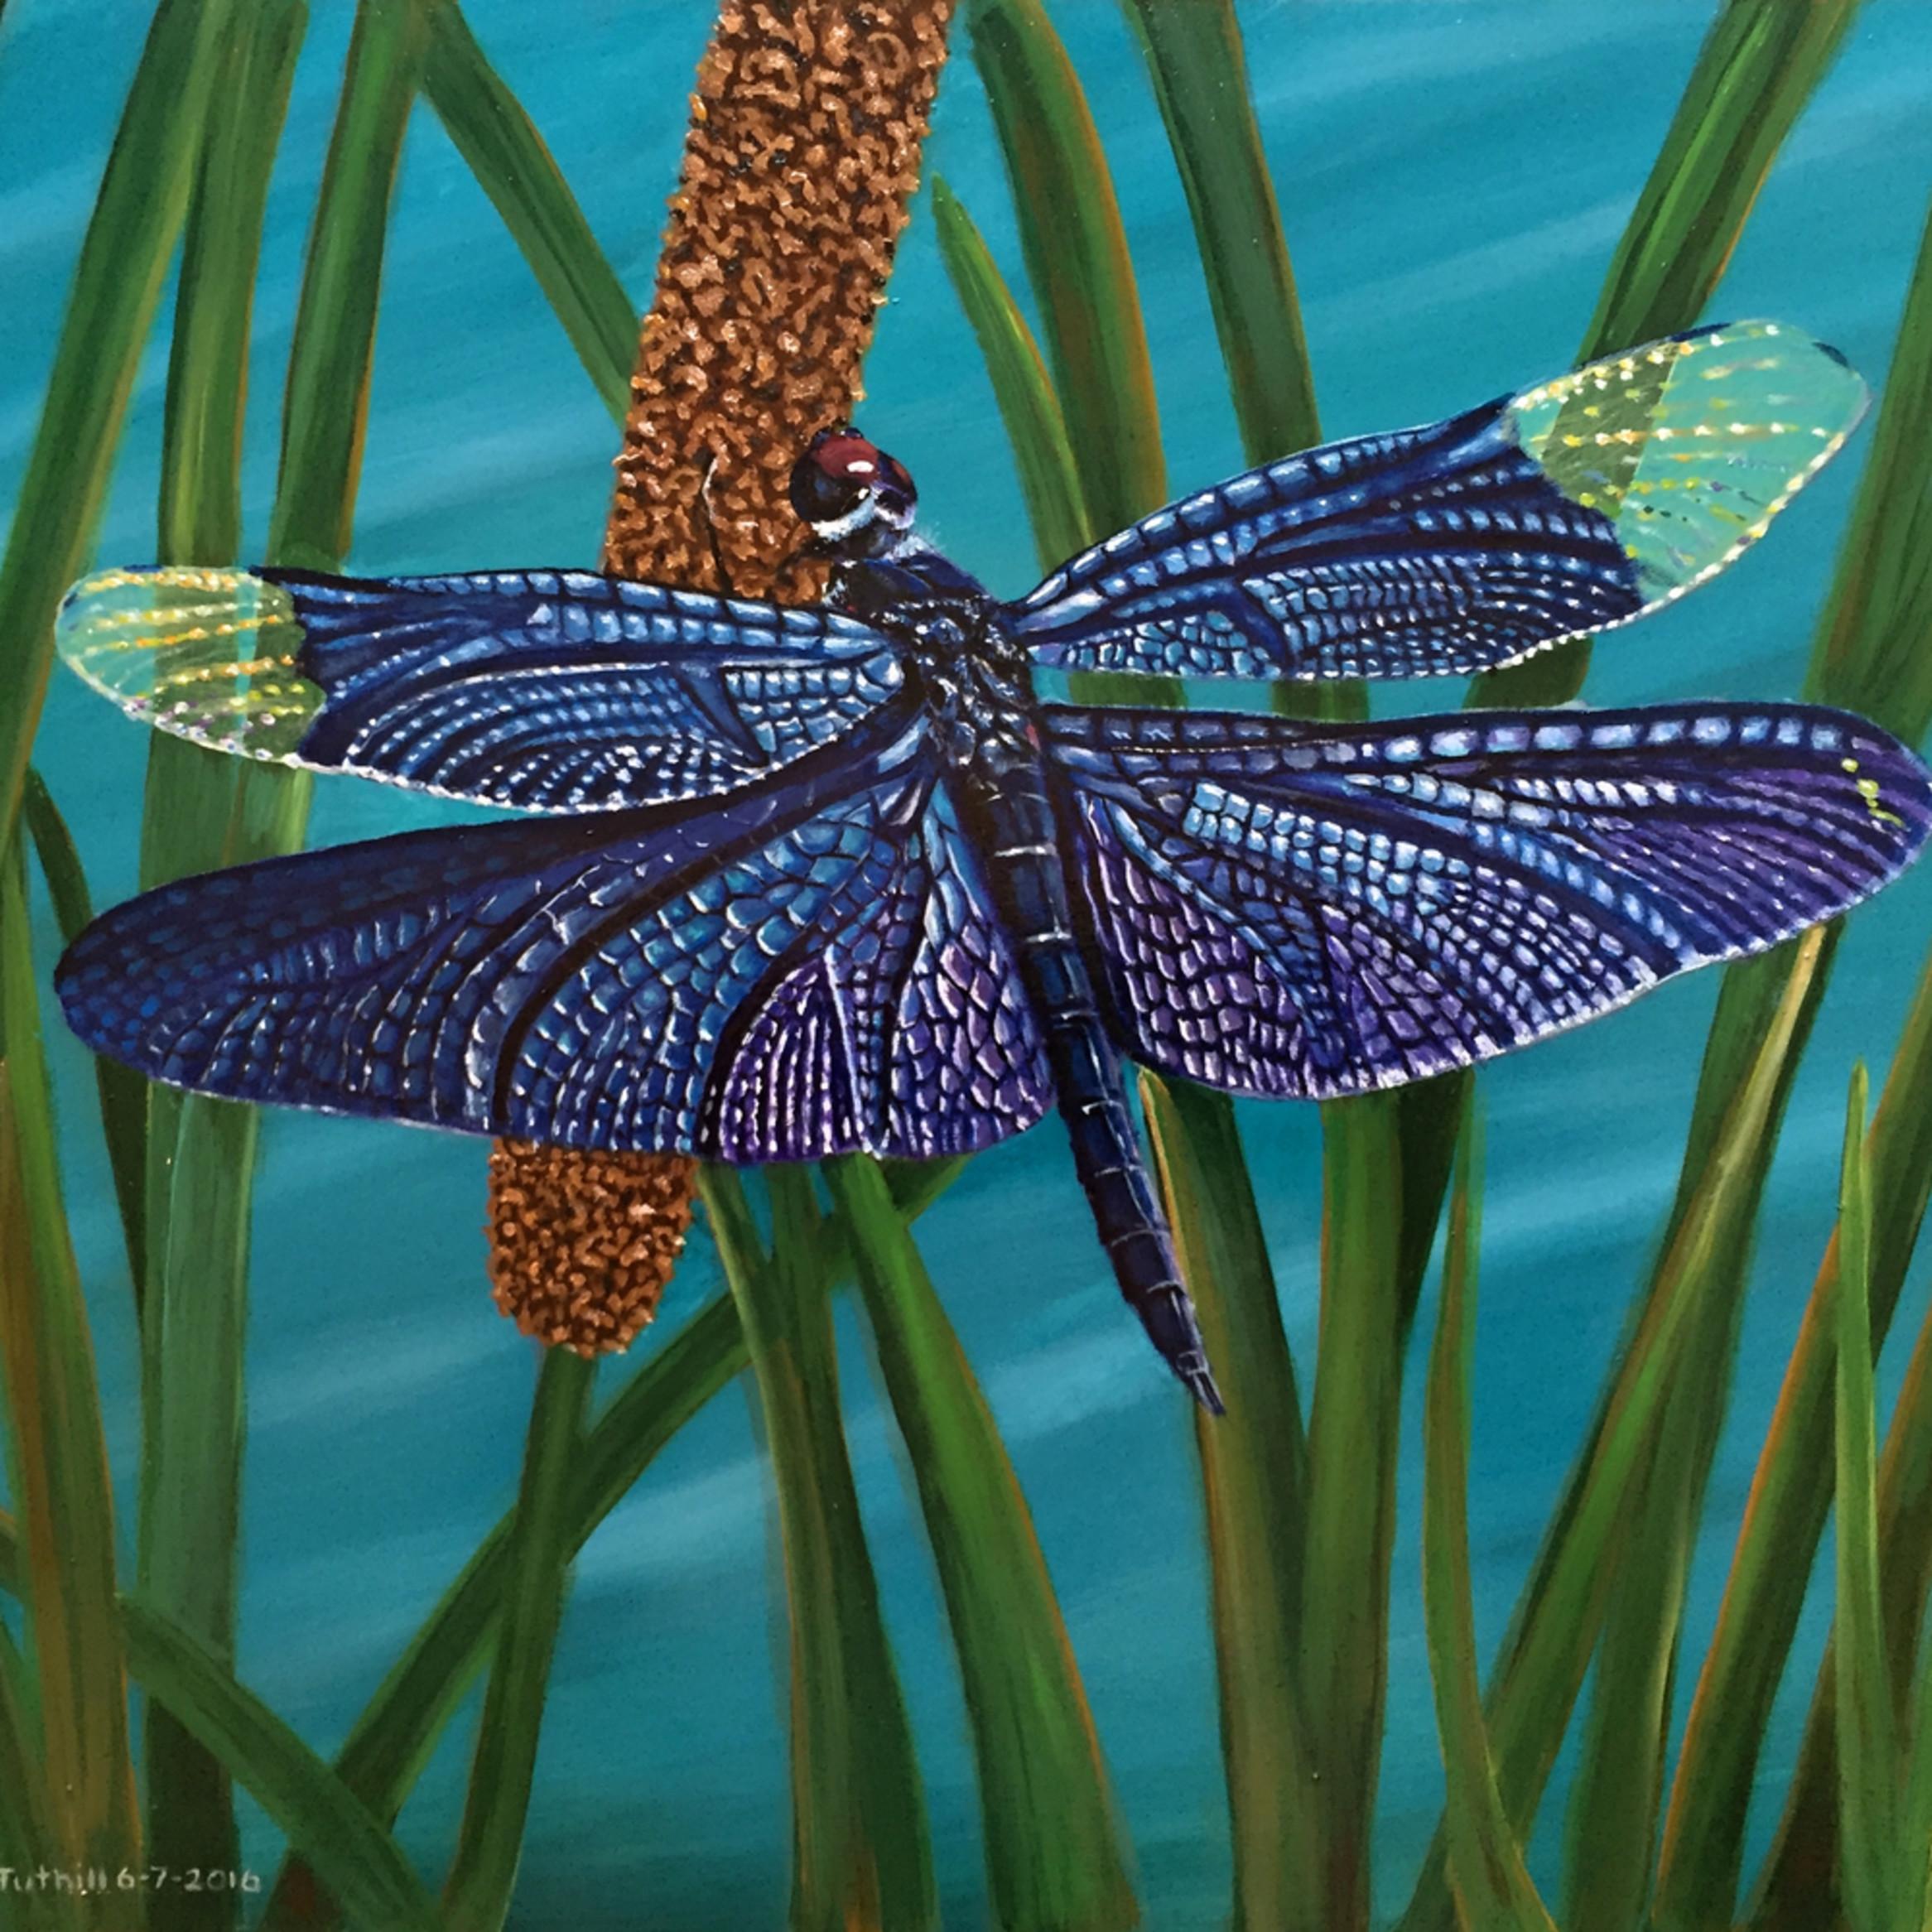 Dragonfly l0wdqm